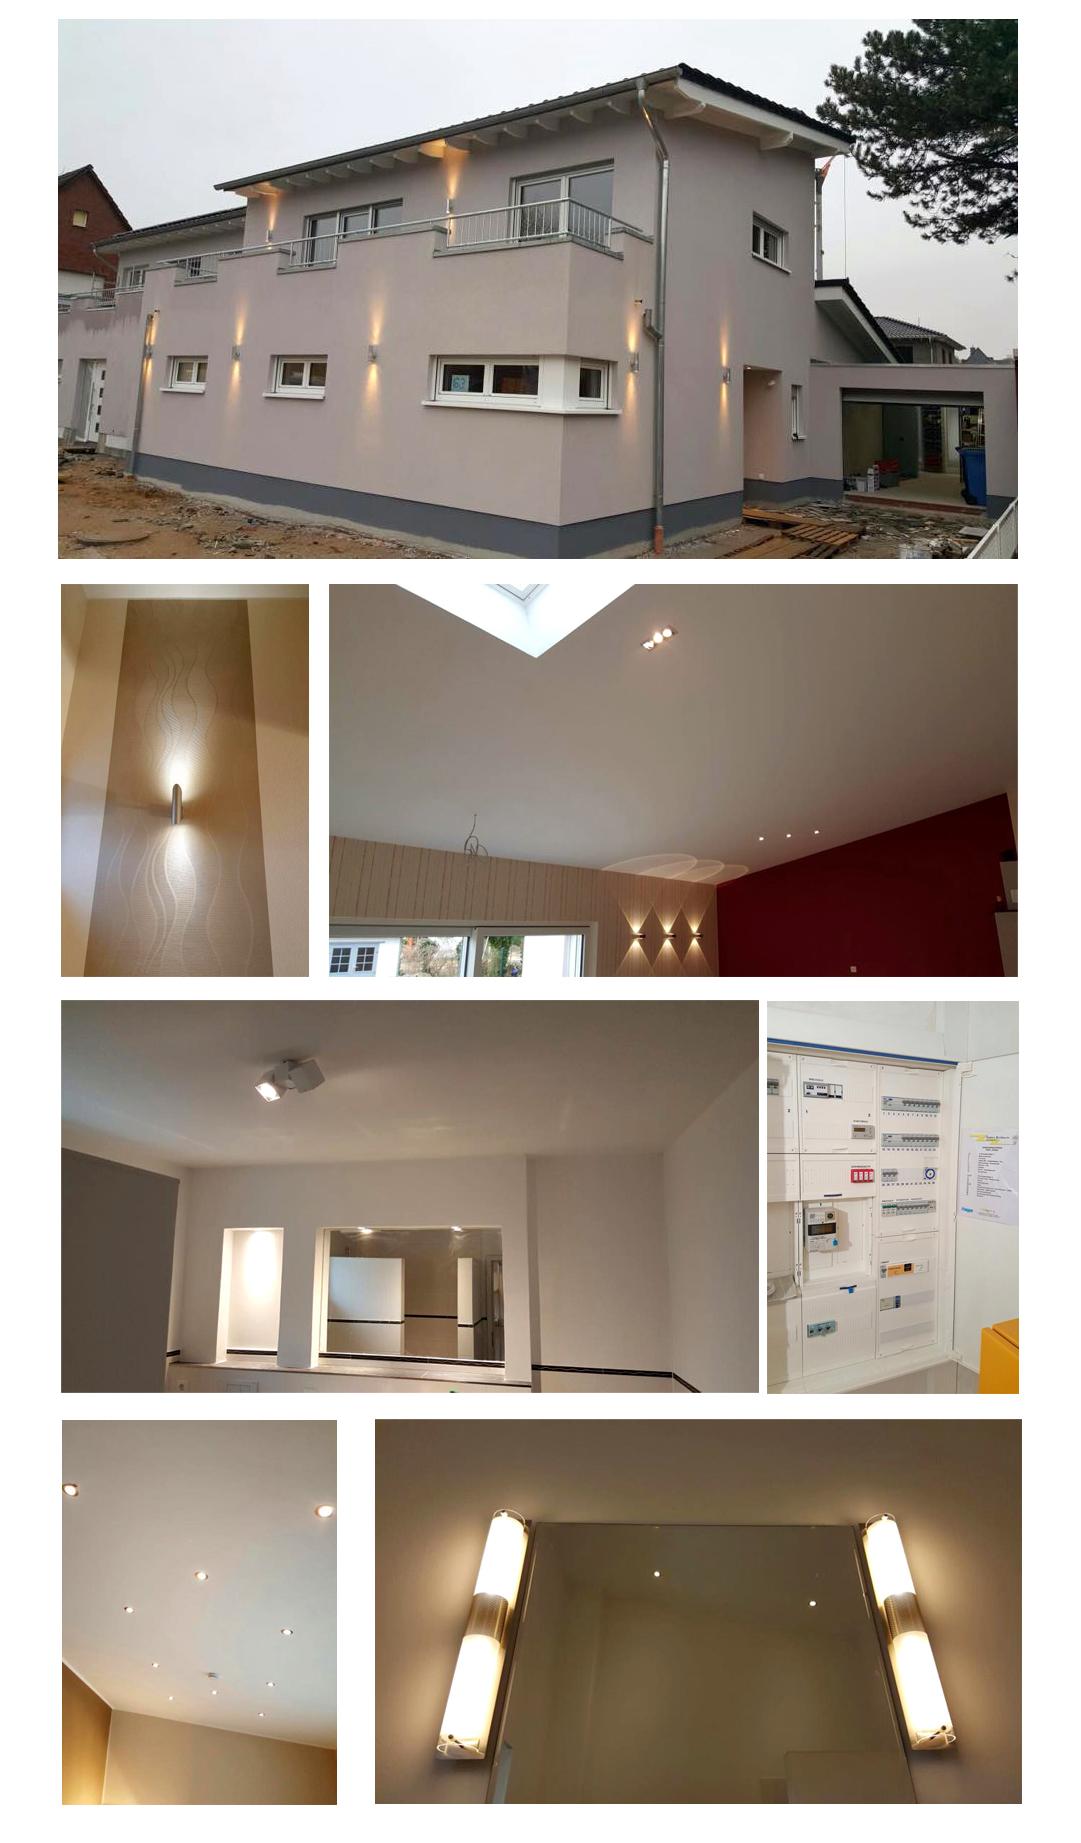 Collage Haus 23-01-2016